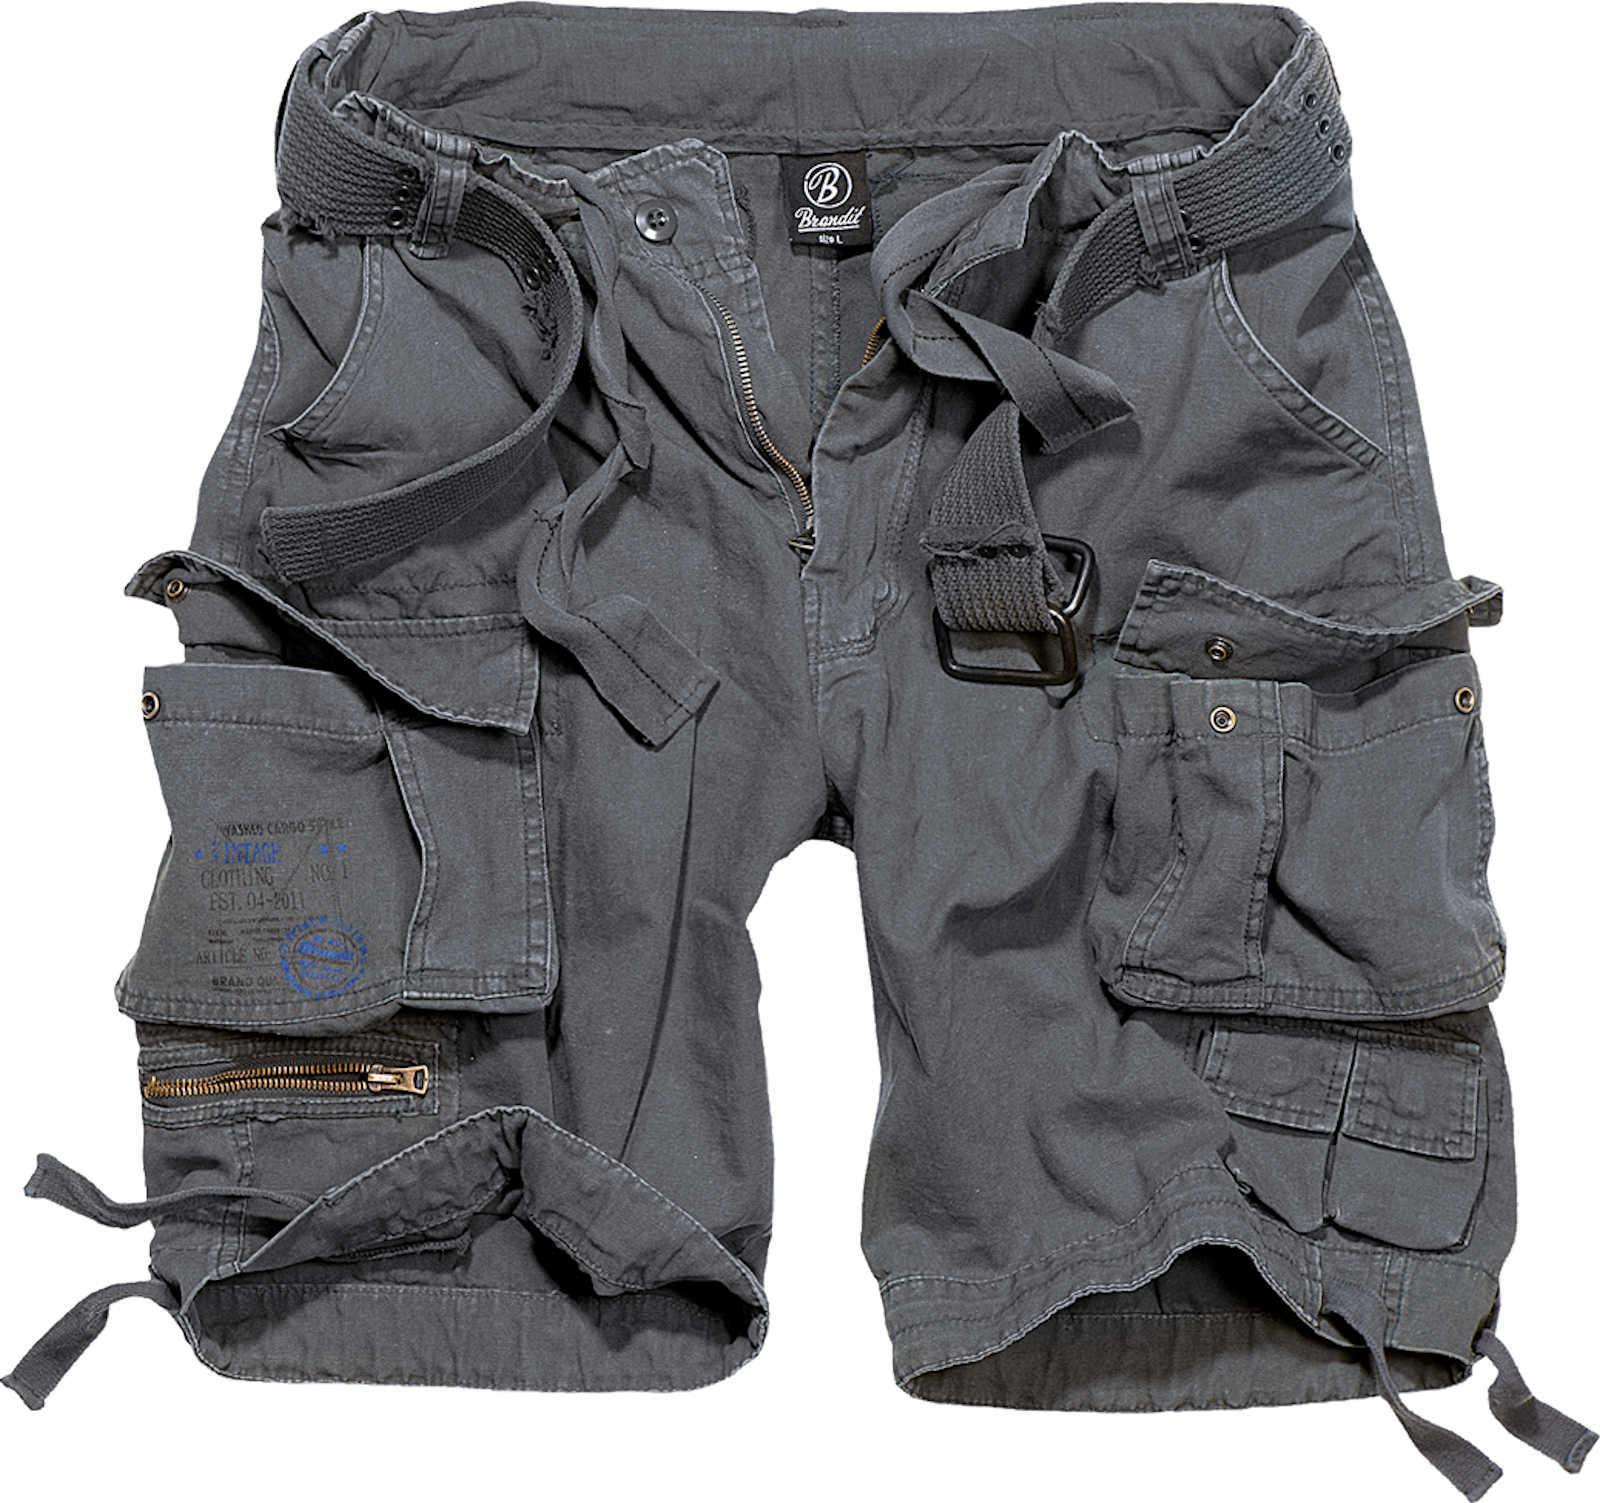 Brandit Savage Shorts Anthracite Gr. XL   eBay 2bb2bcdd86